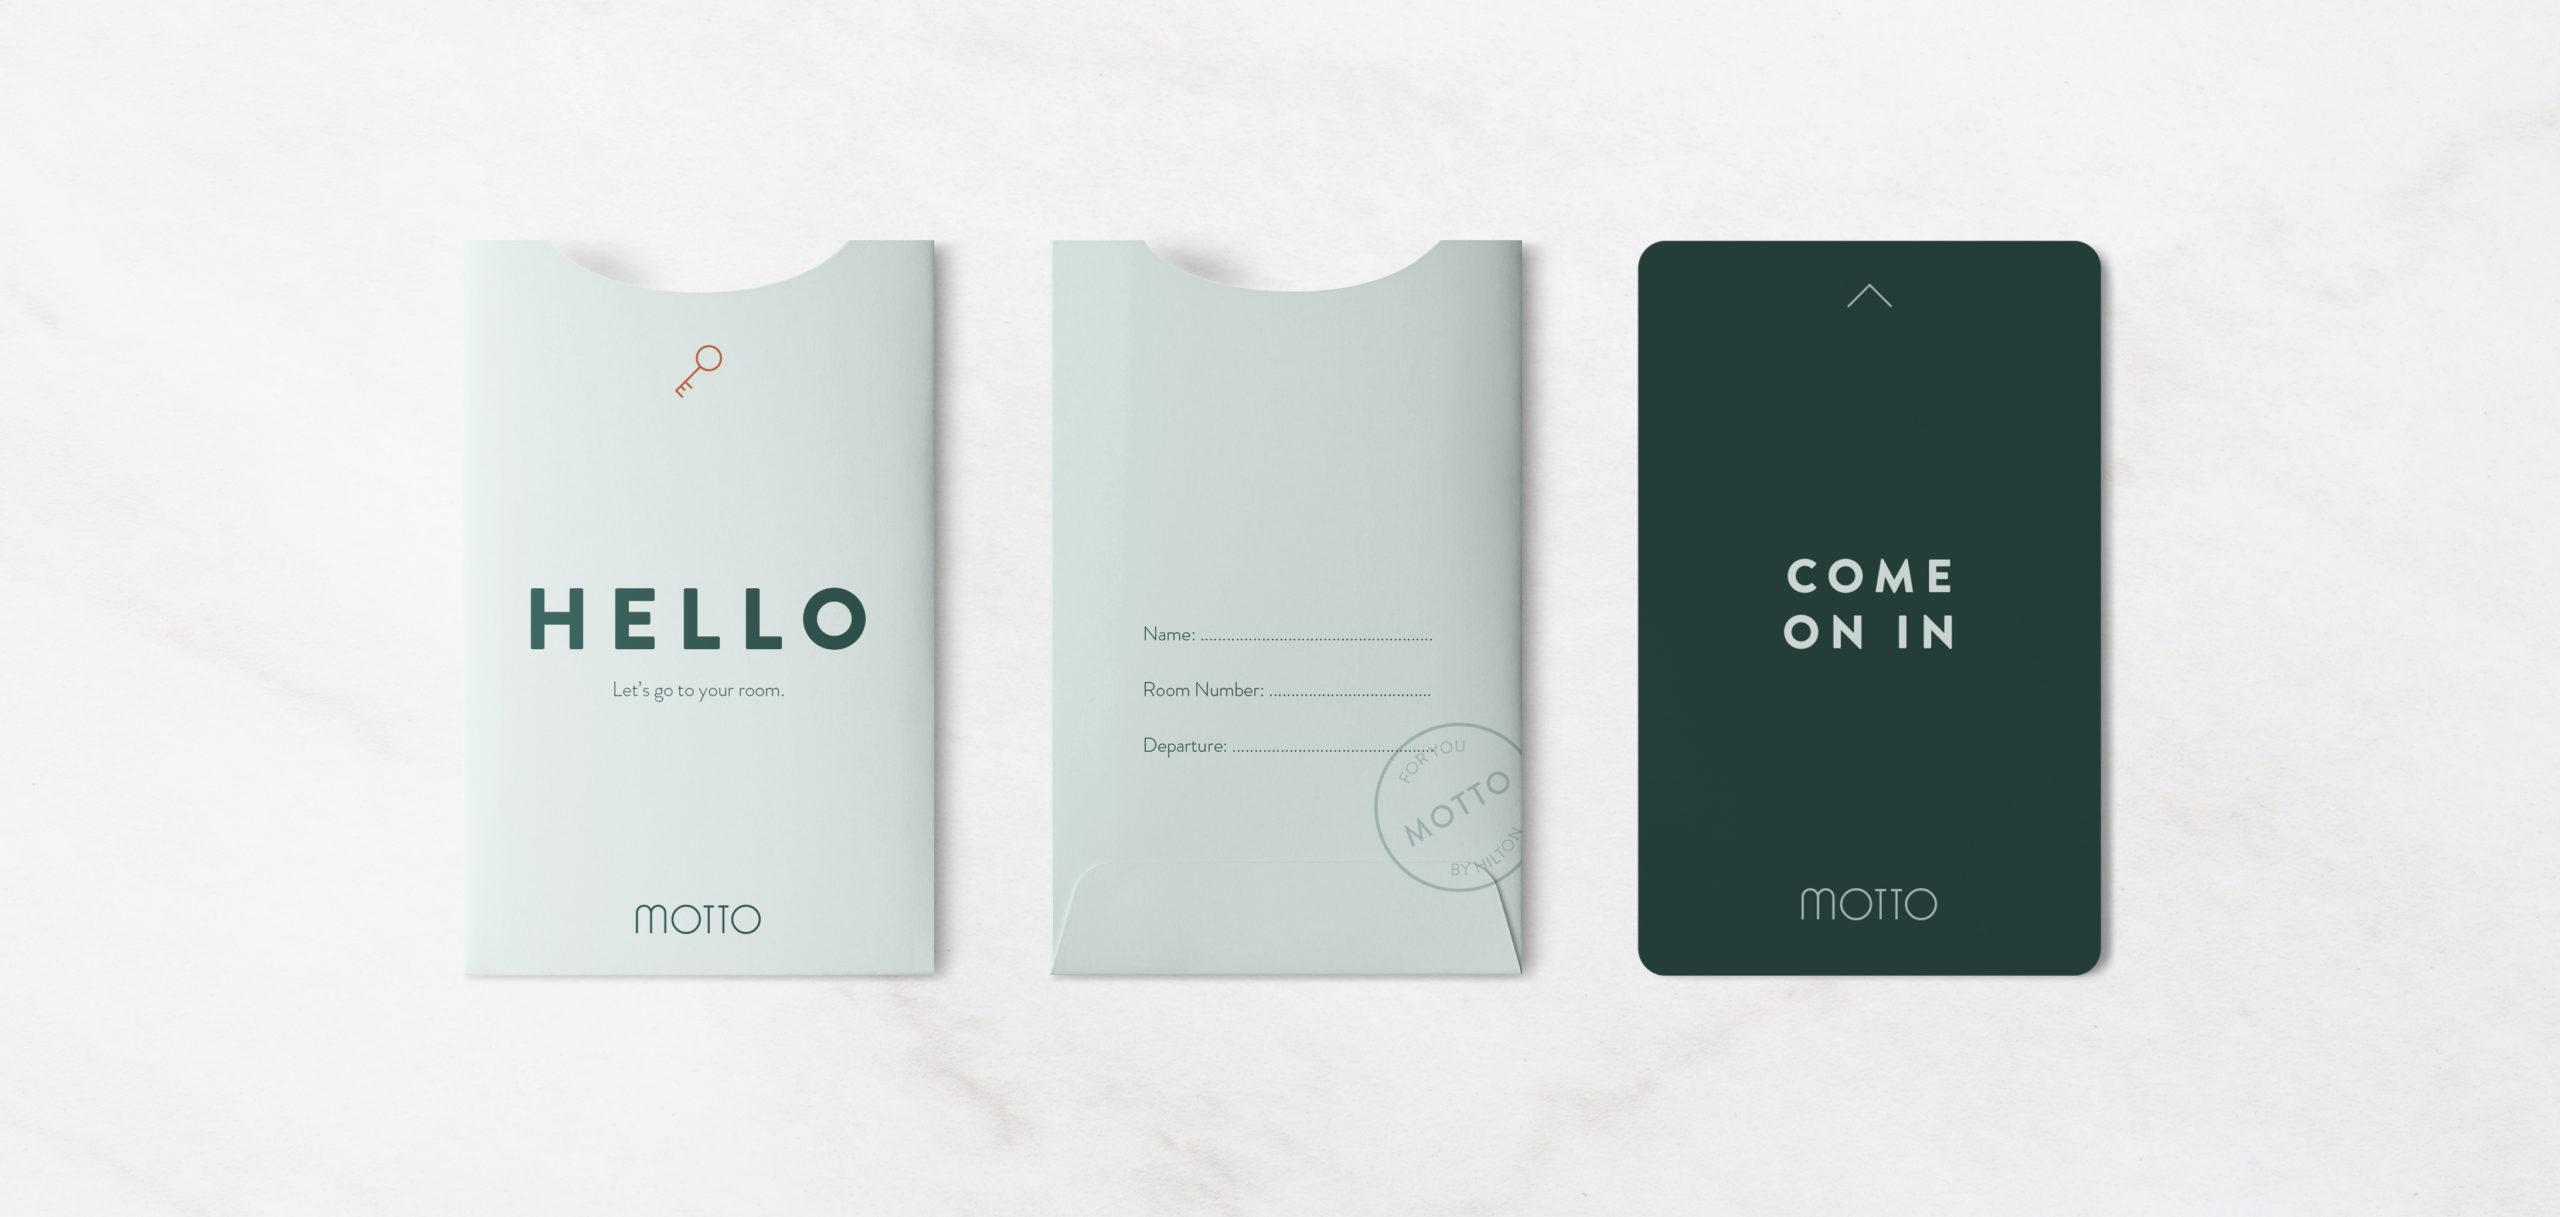 010619_Motto_Keycards_Mockup